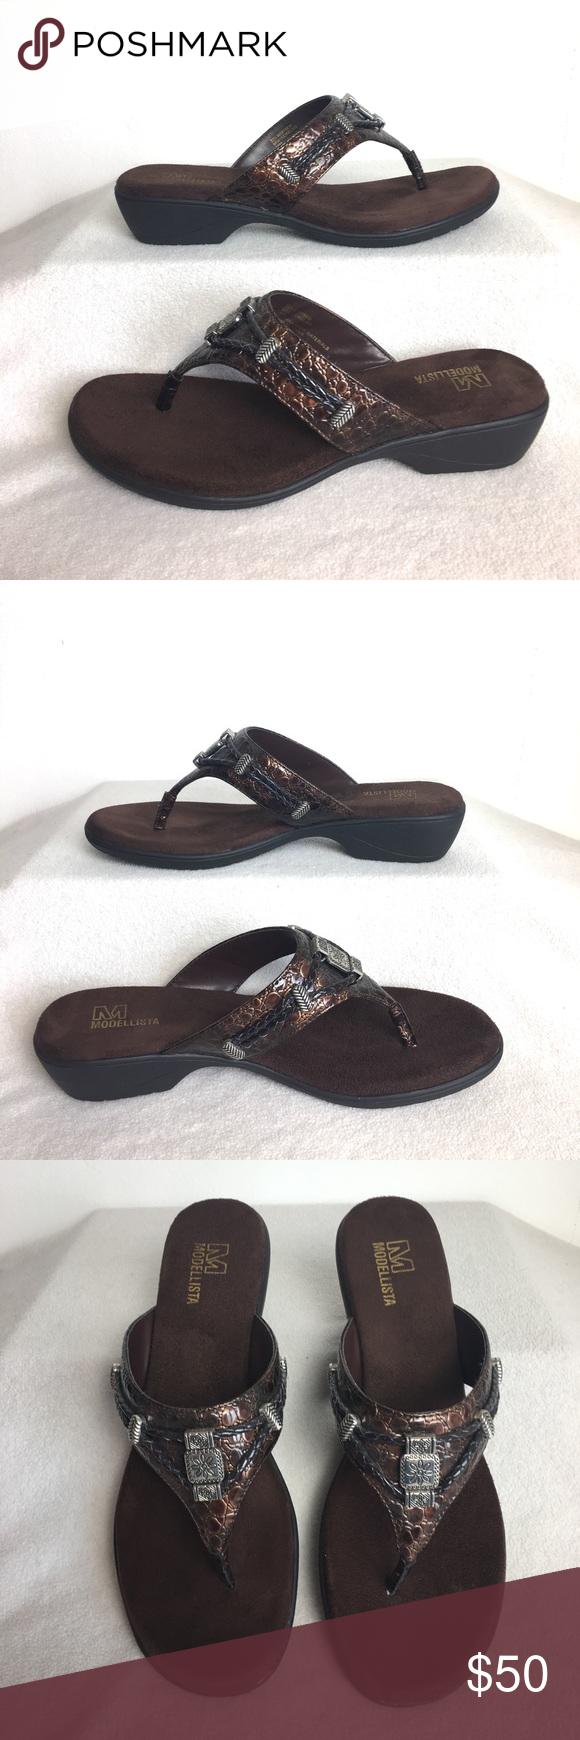 3996a25a0444 Modellista 10 Kelso Flip Flop Heels Sandals Shoes Modellista Size 10 Kelso  Open Flip Flop Thong Heels Sandals Cushioned Shoes NEW without box  modellista ...